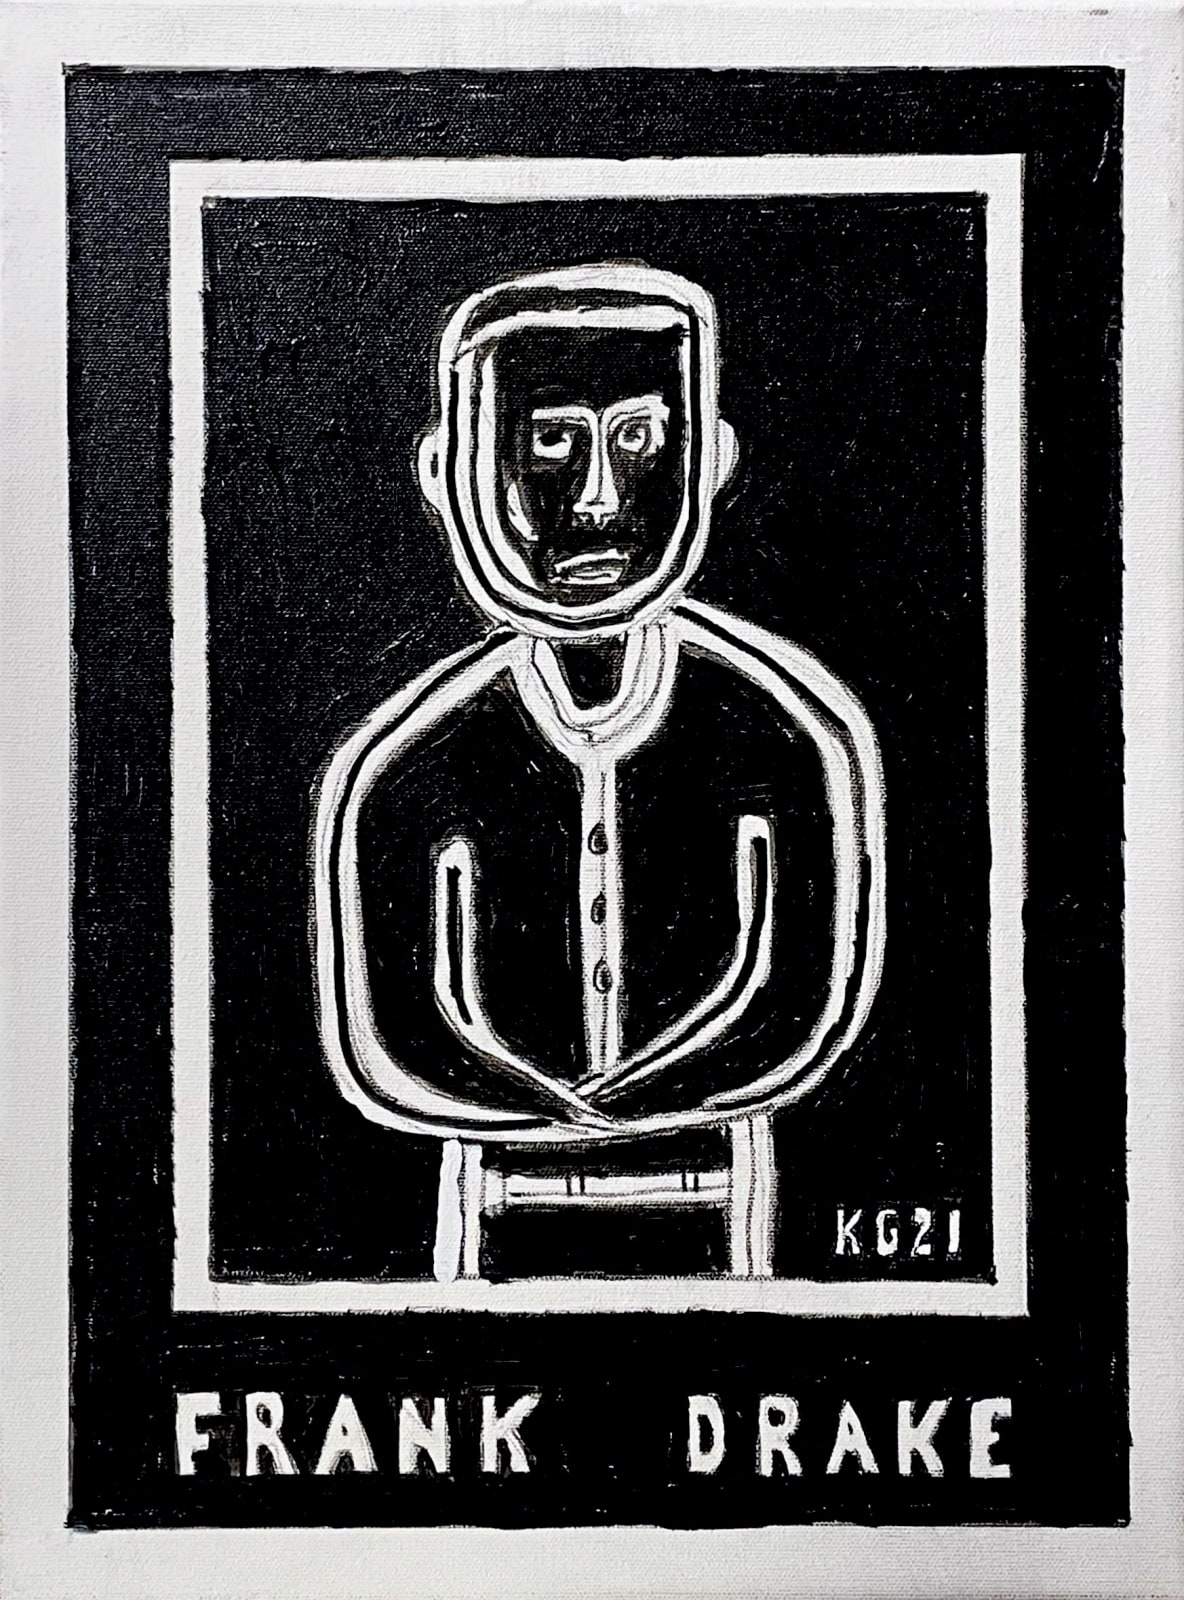 KG 544